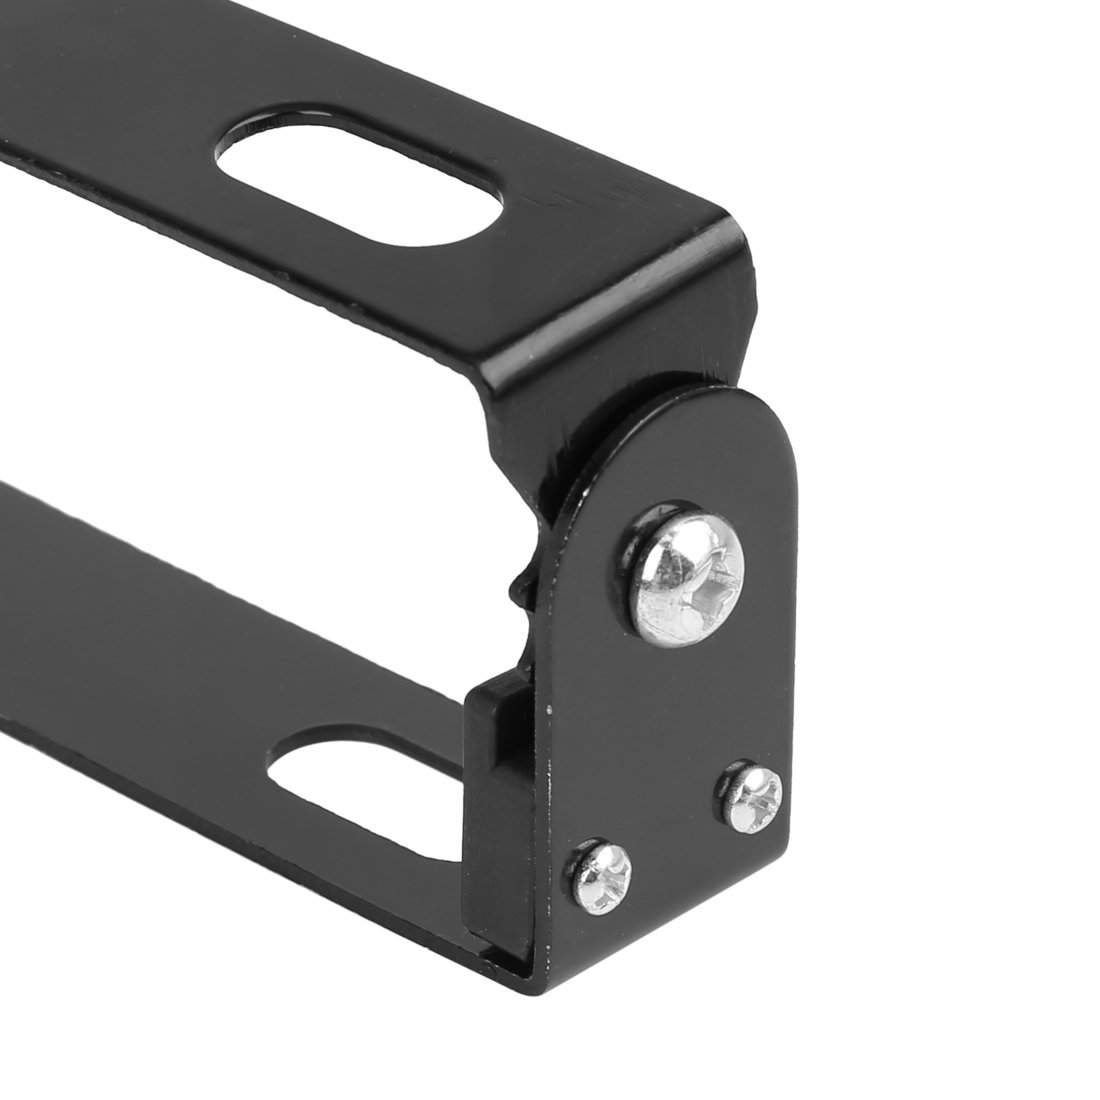 uxcell Black Metal Adjustable Angle Motorcycle License Plate Holder Bracket Frame Stand